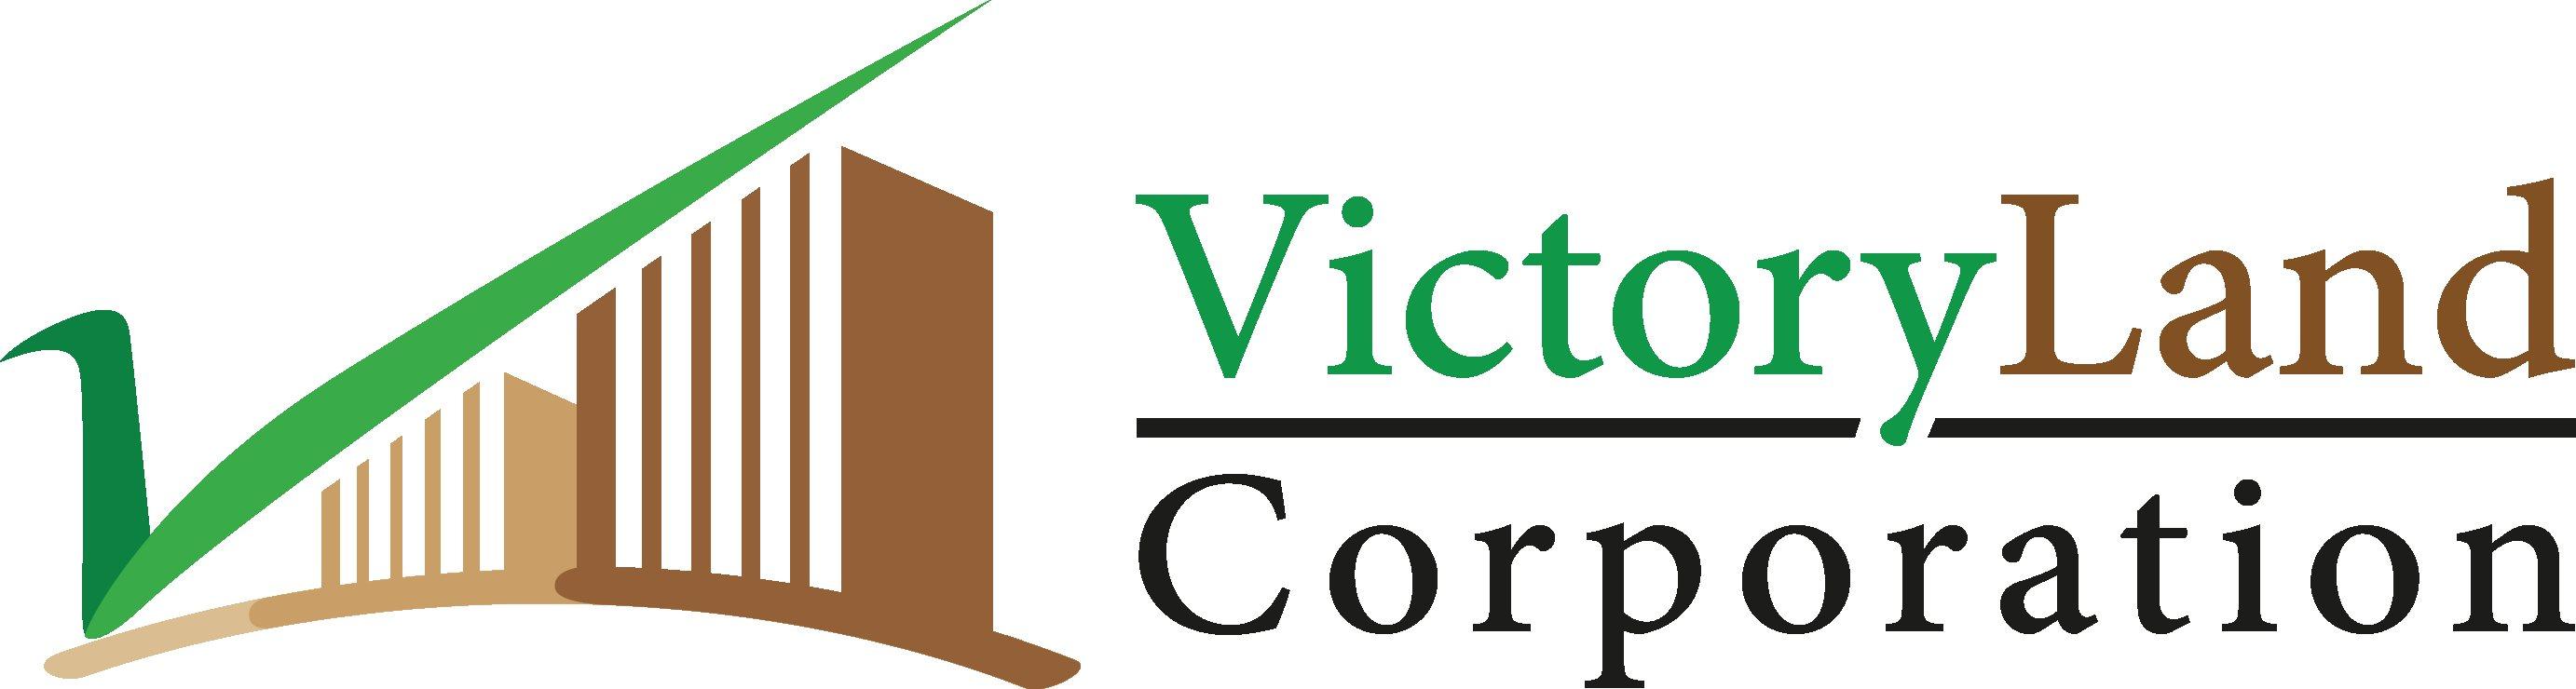 VICTORYLAND CORPORATION